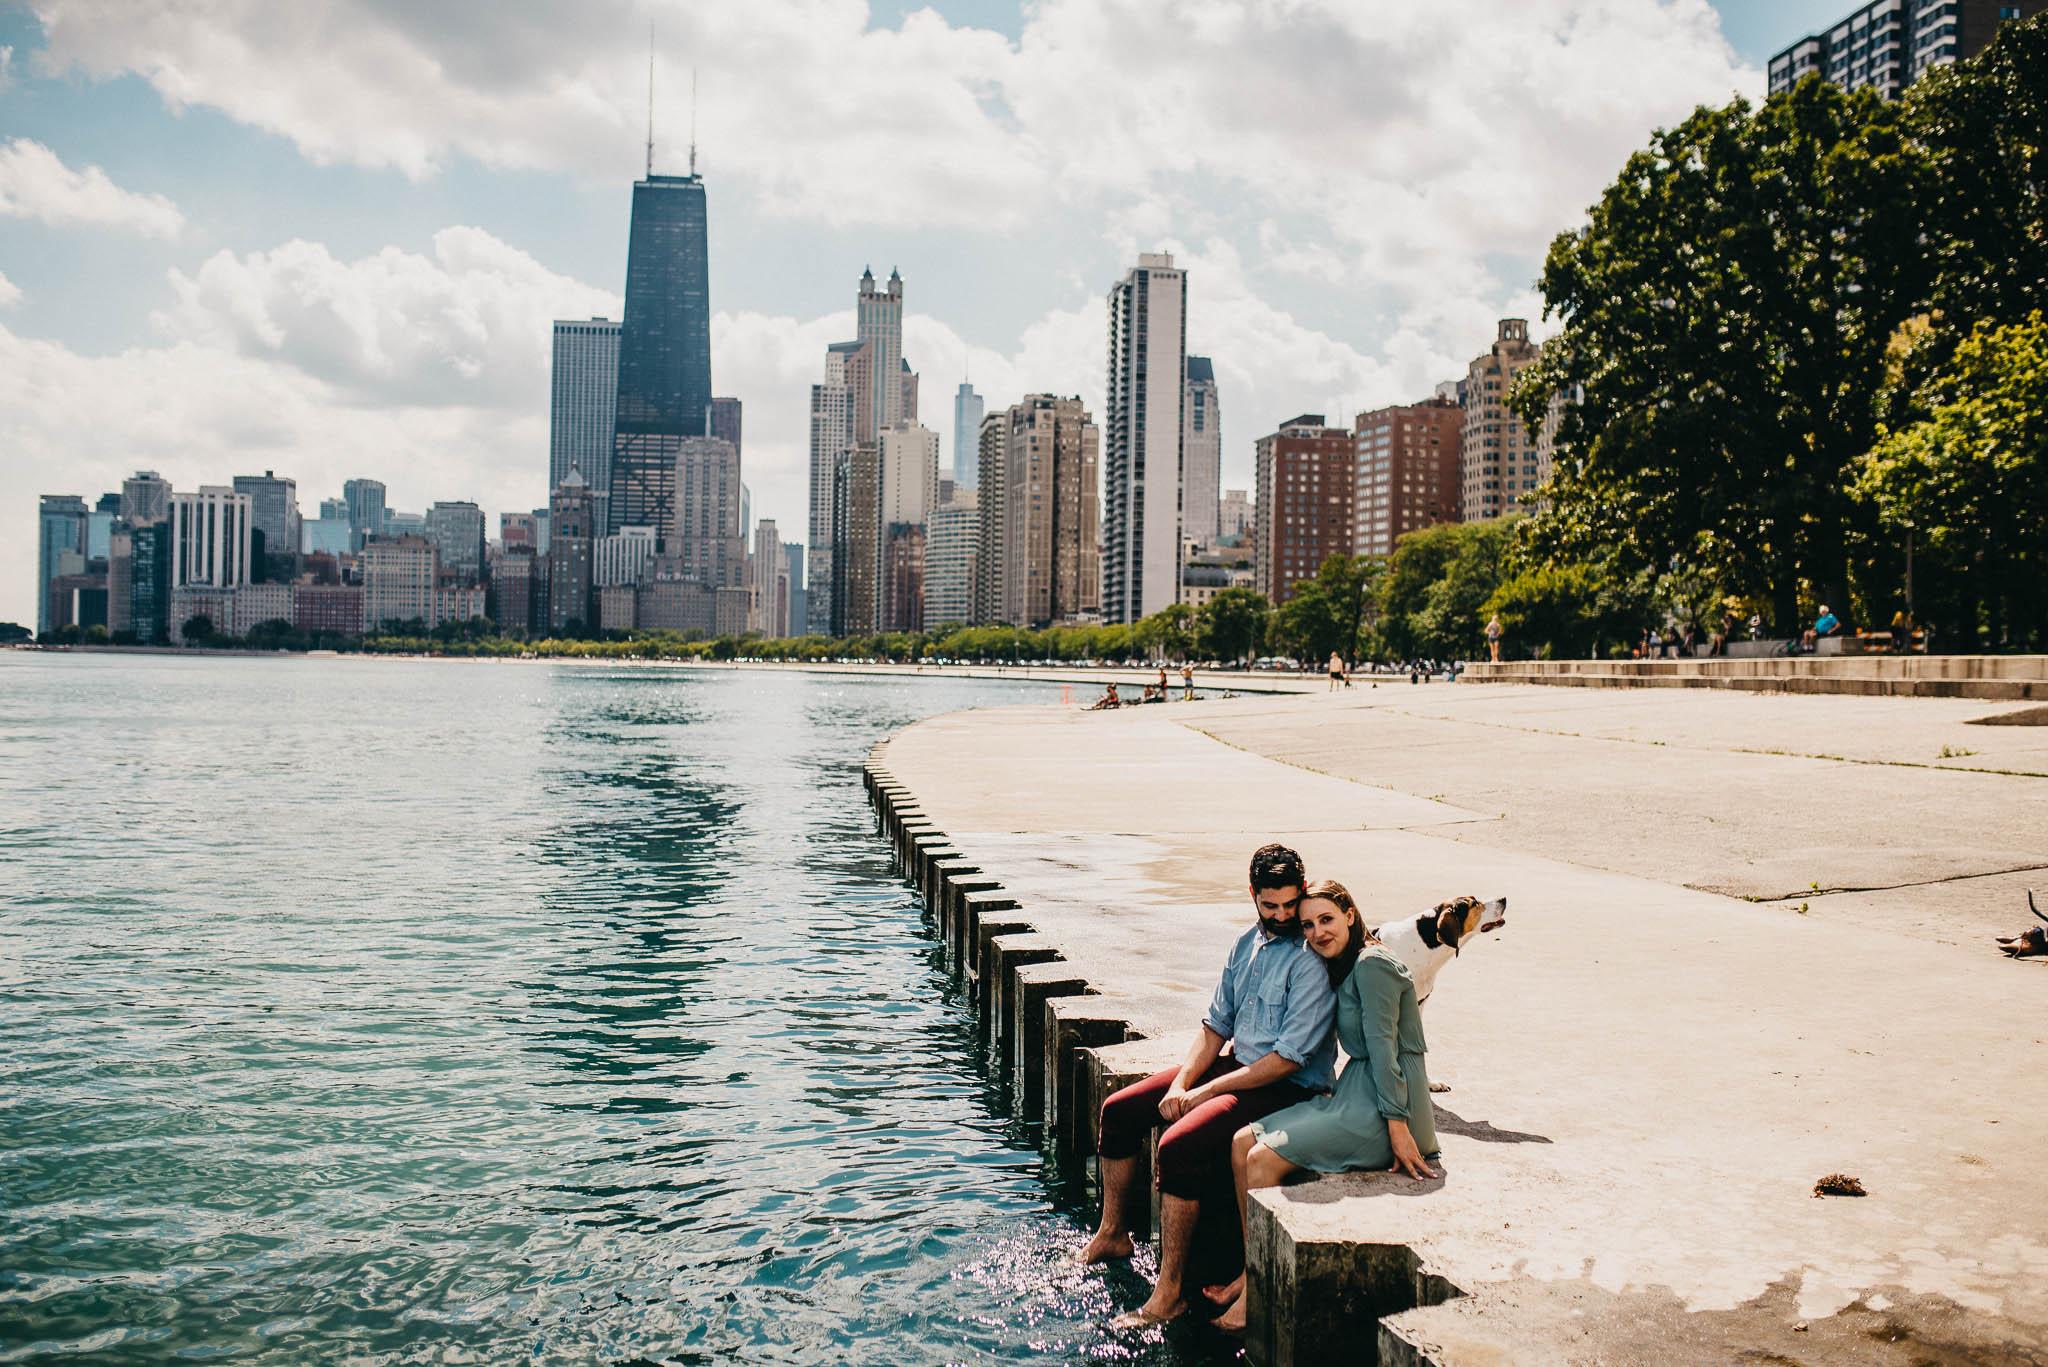 An engaged couple snuggling near lake Michigan